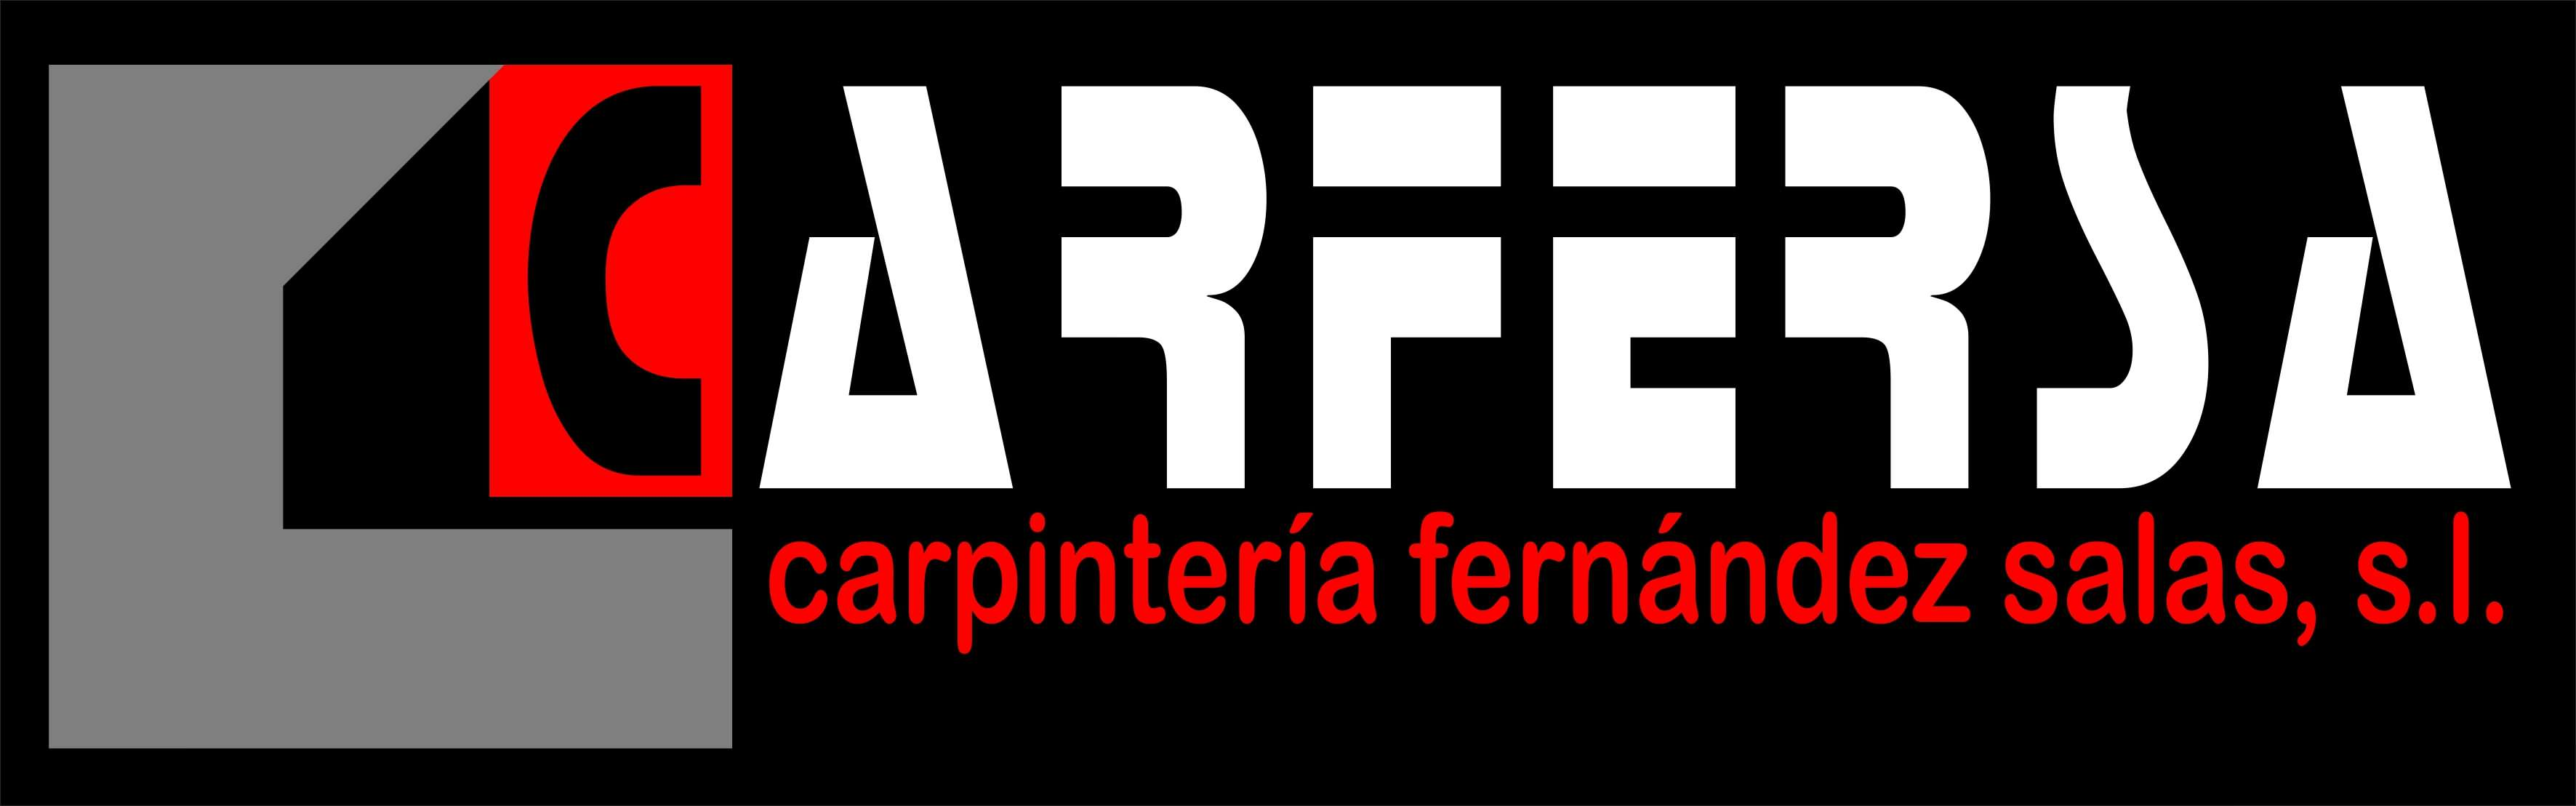 carfersa